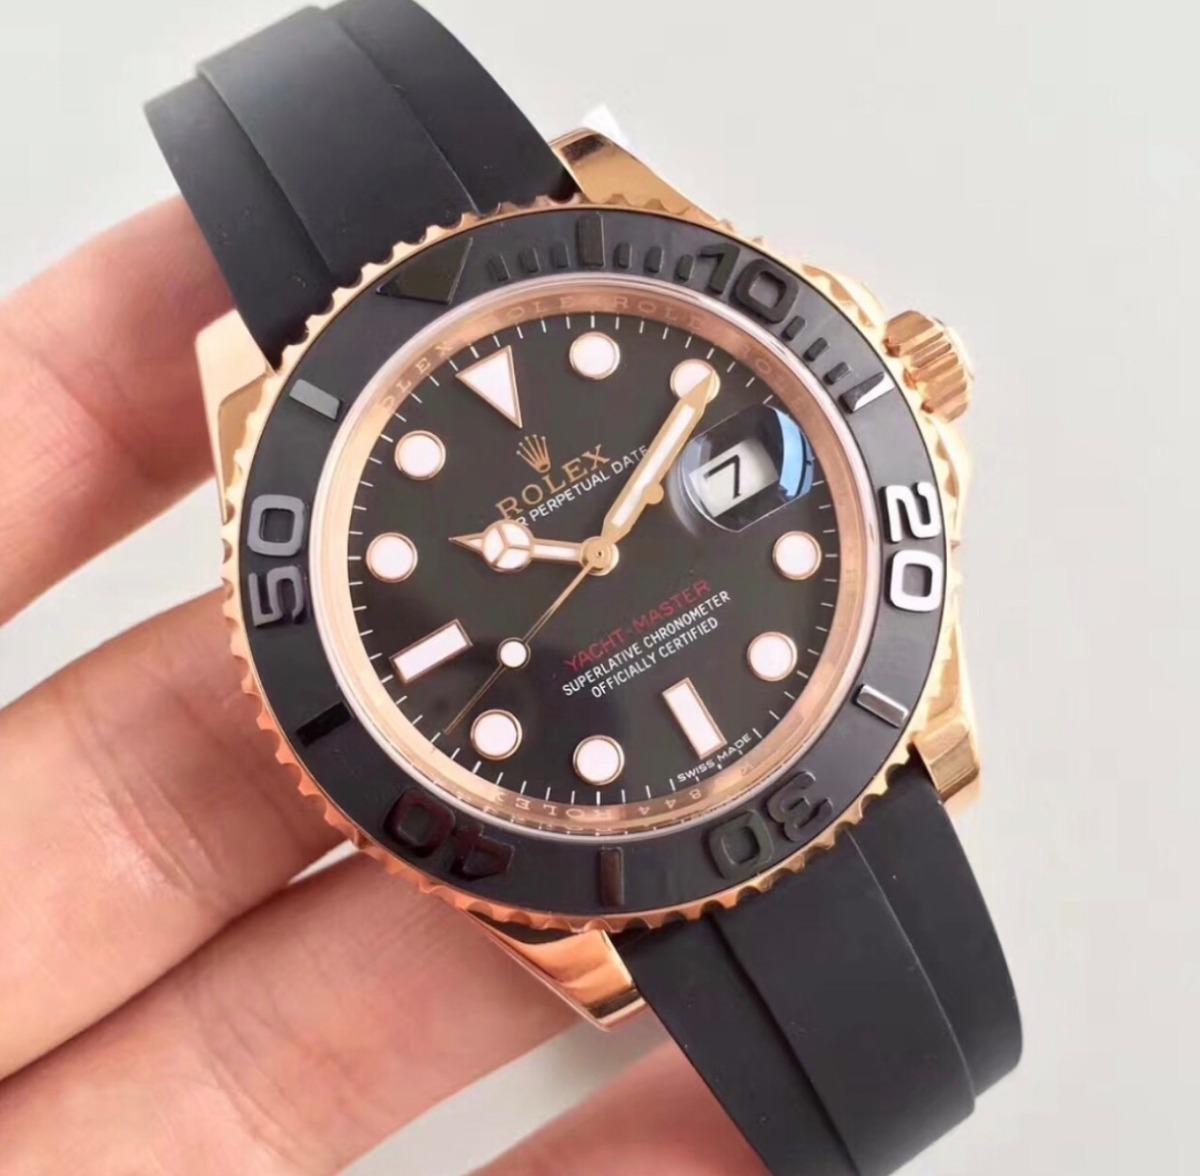 b925f15f7c6 relógio rolex yacht master oysterflex masculino importado. Carregando zoom.